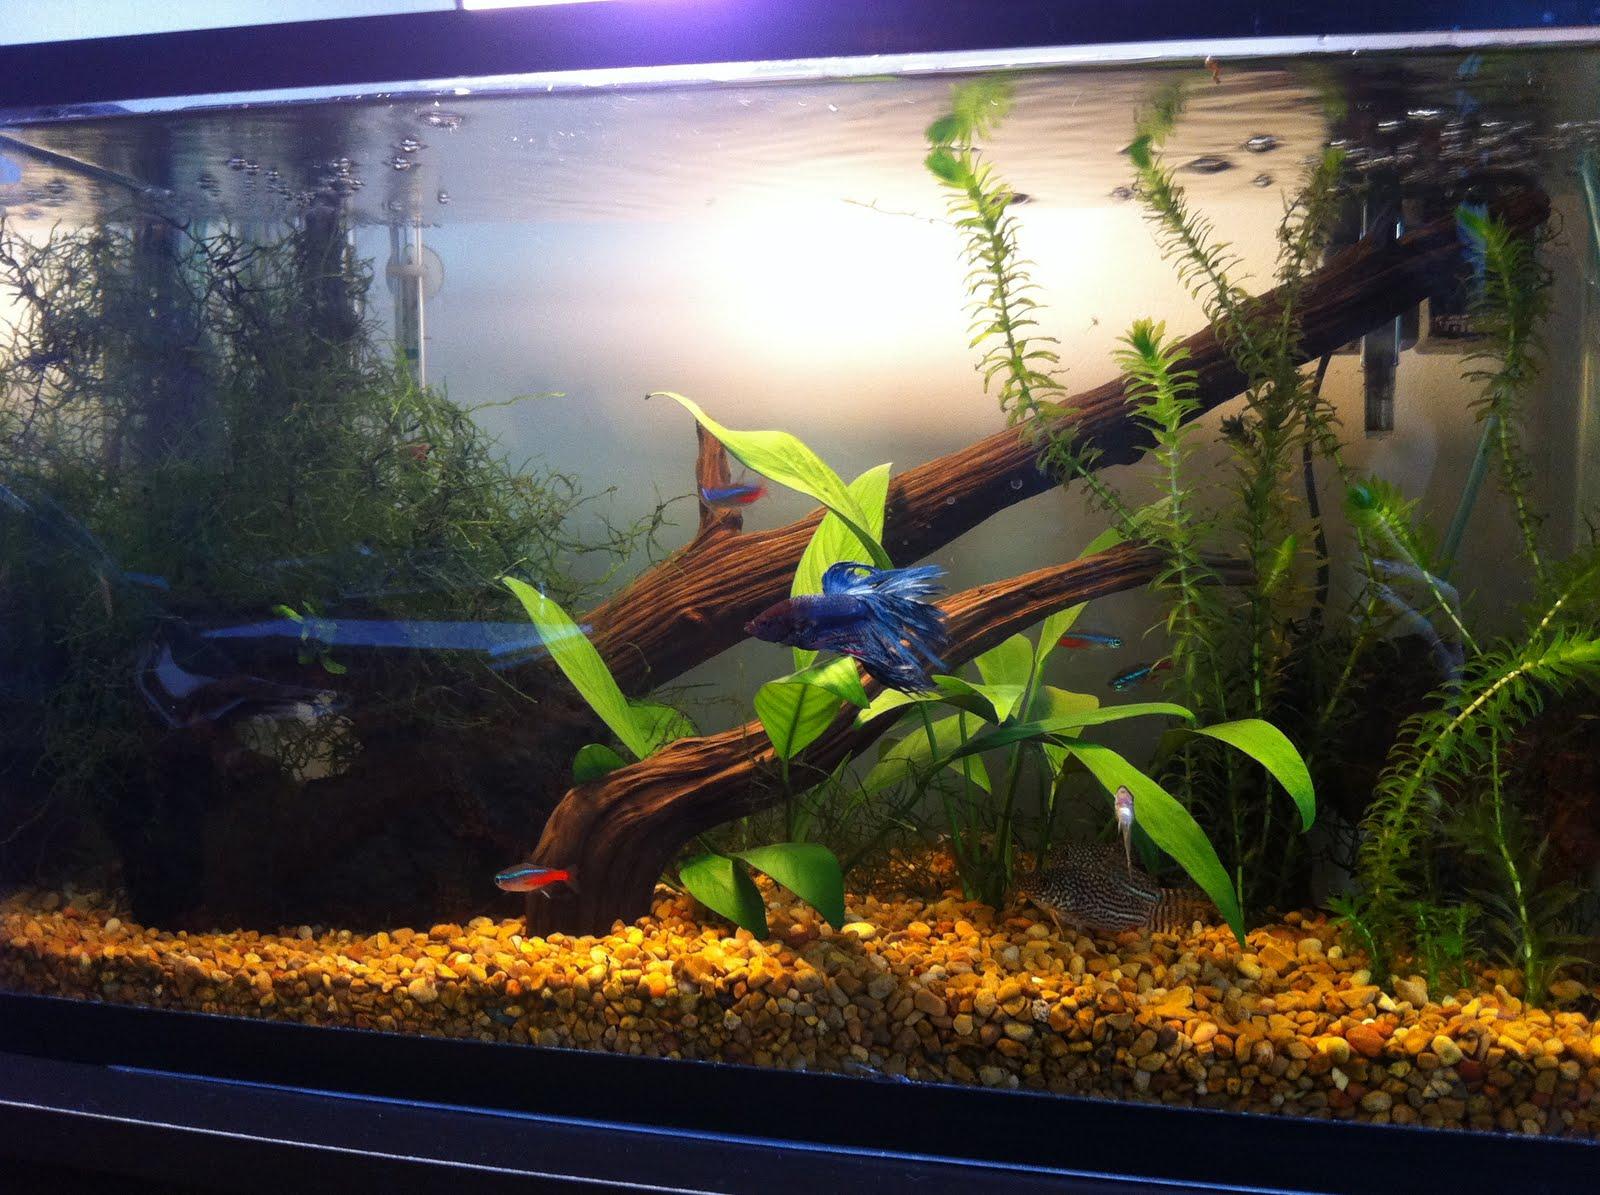 Megans Aquarium Diary: African Dwarf Frogs